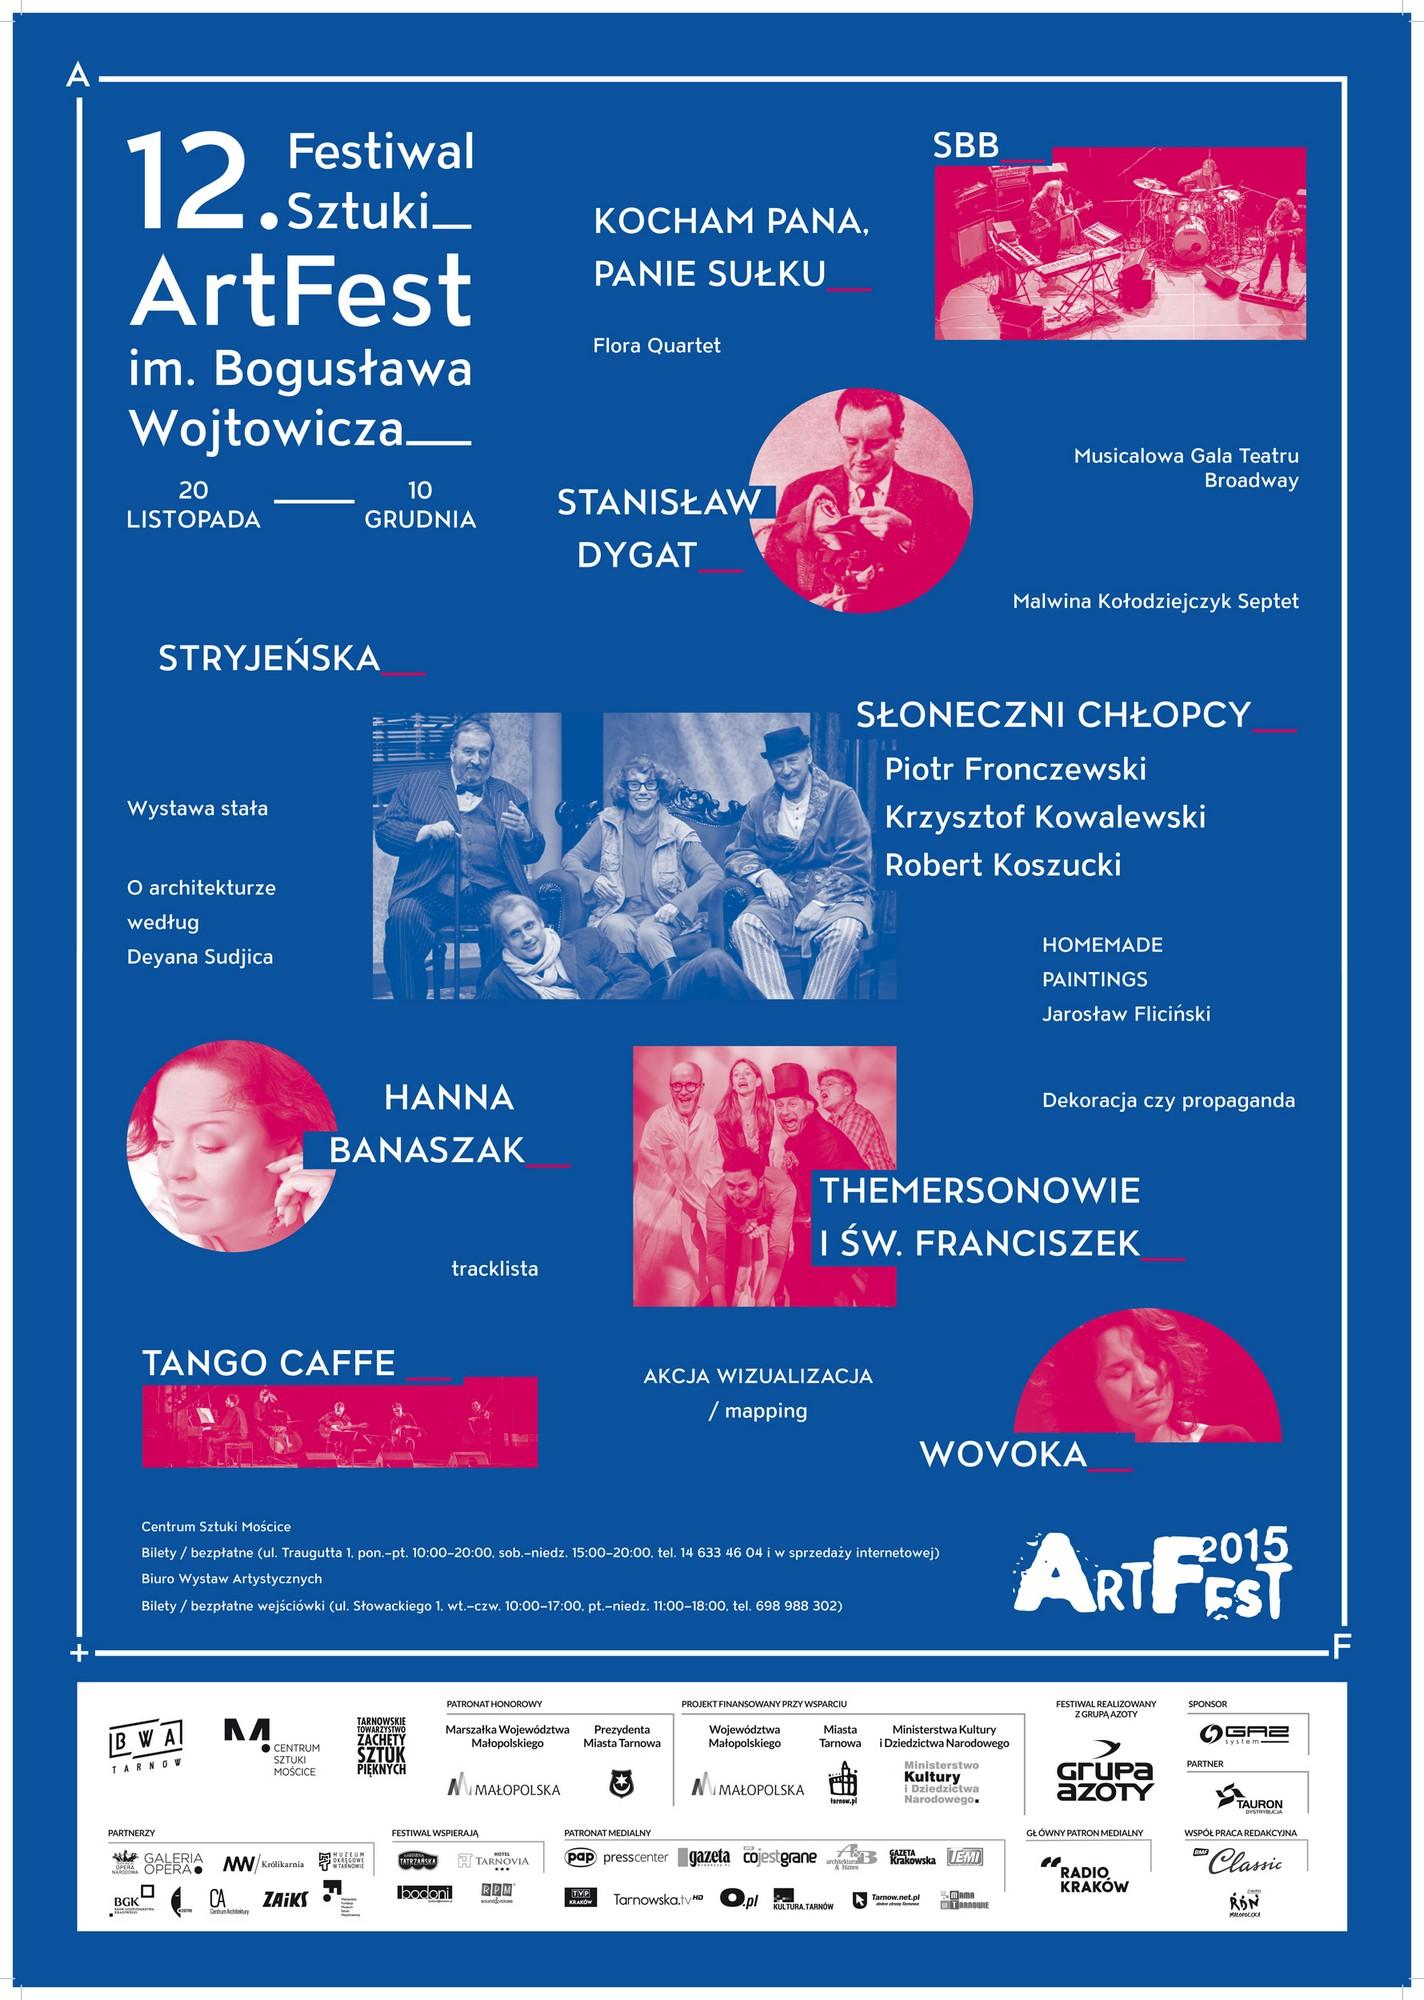 12. Festiwal Sztuki ArtFest – plakat (źródło: materiały prasowe)